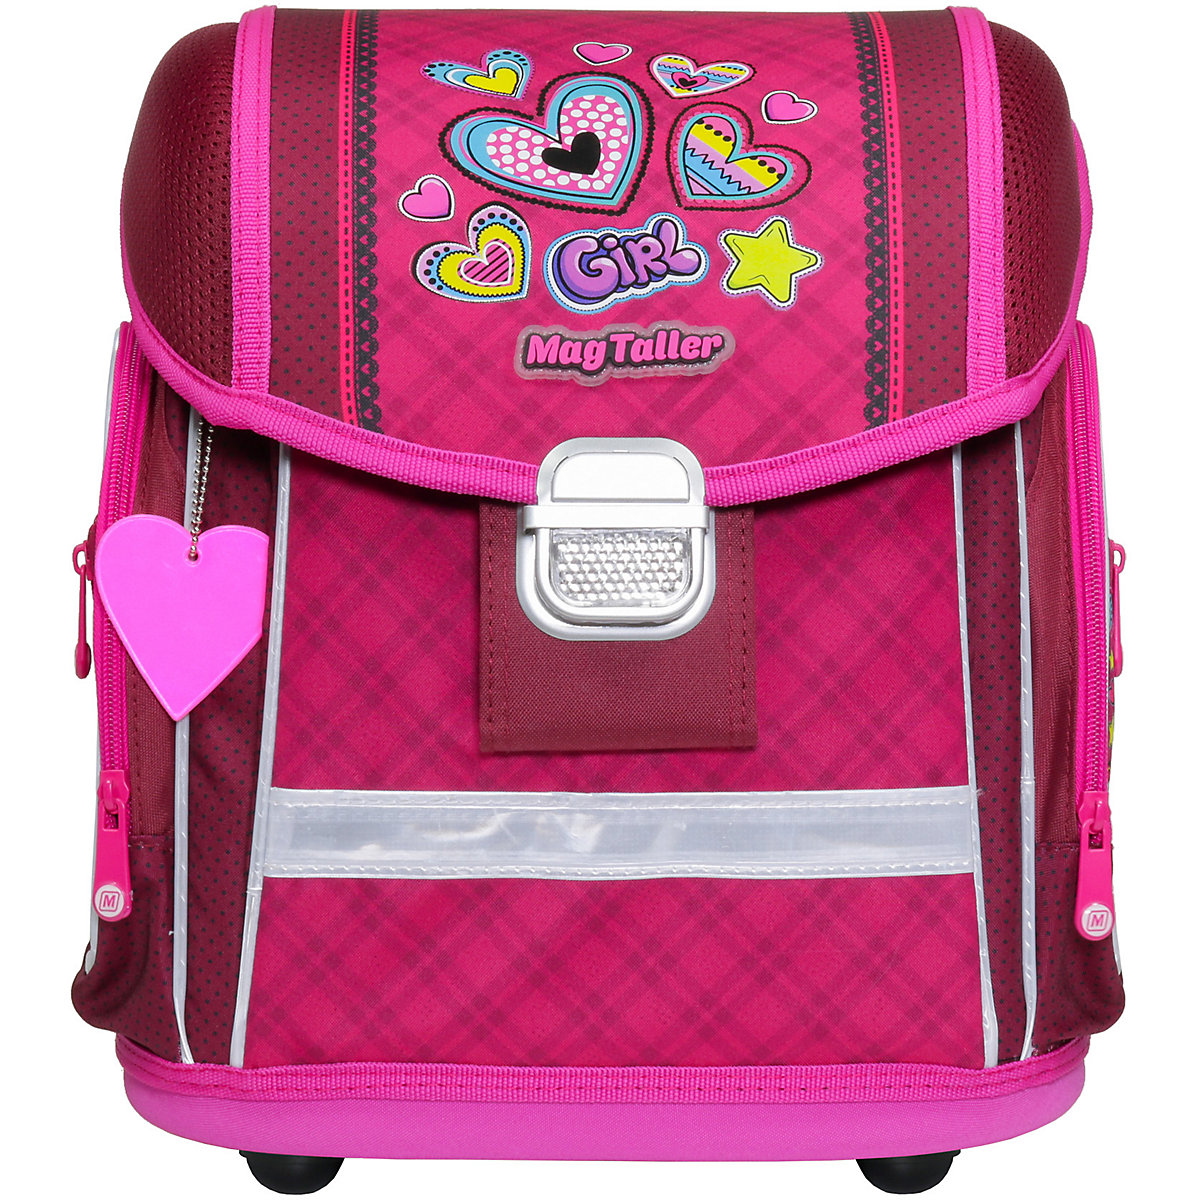 School Bags MAGTALLER 11154978 Schoolbag Backpack Knapsacks Orthopedic Bag For Boy And Girl Animals Flower Sprints MTpromo